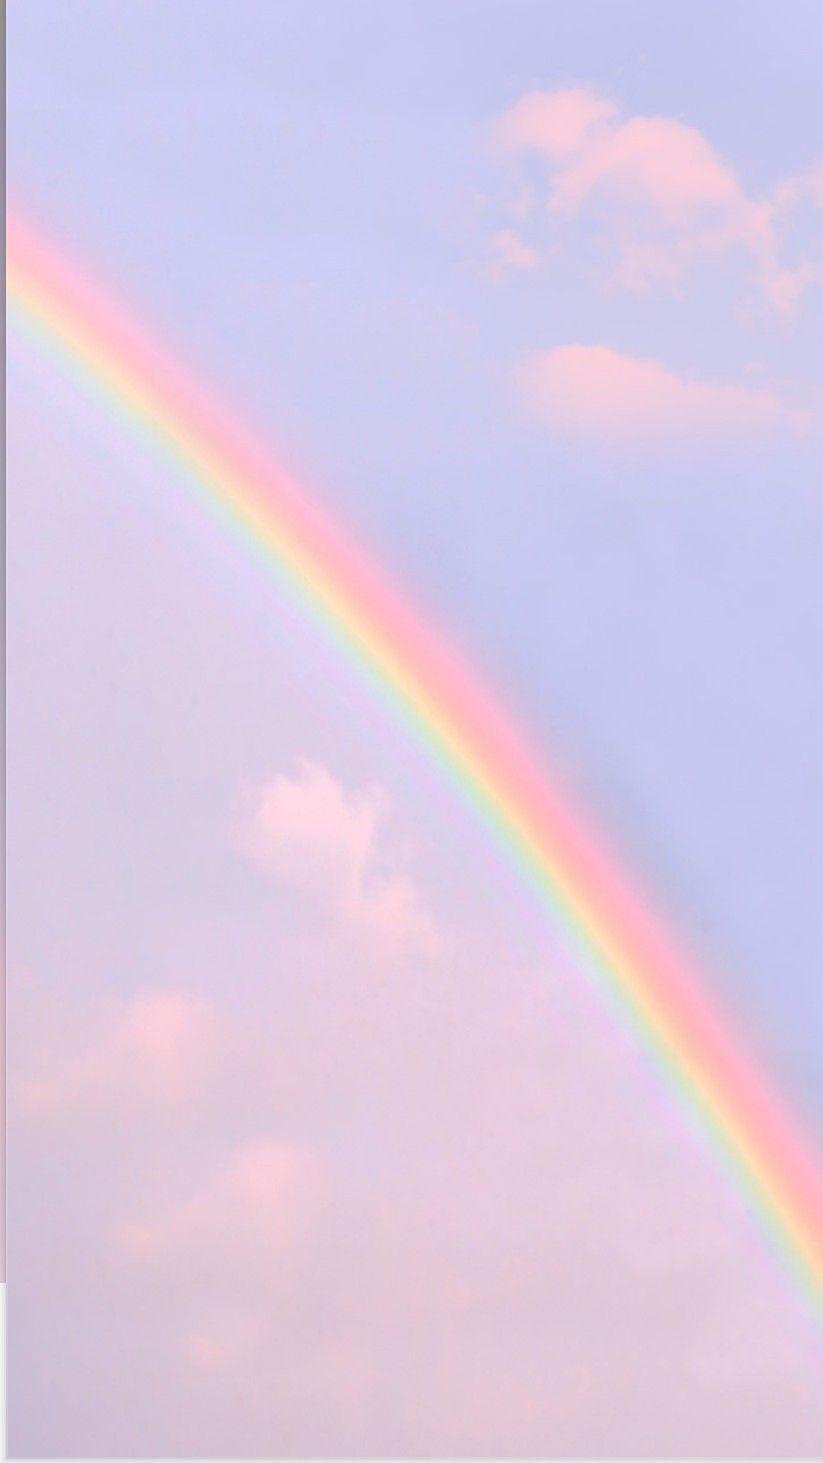 Rainbow Sky Daytime Meteorological Phenomenon Cloud Atmosphere 862580134862041464 In 2020 Clouds Wallpaper Iphone Rainbow Wallpaper Iphone Rainbow Wallpaper